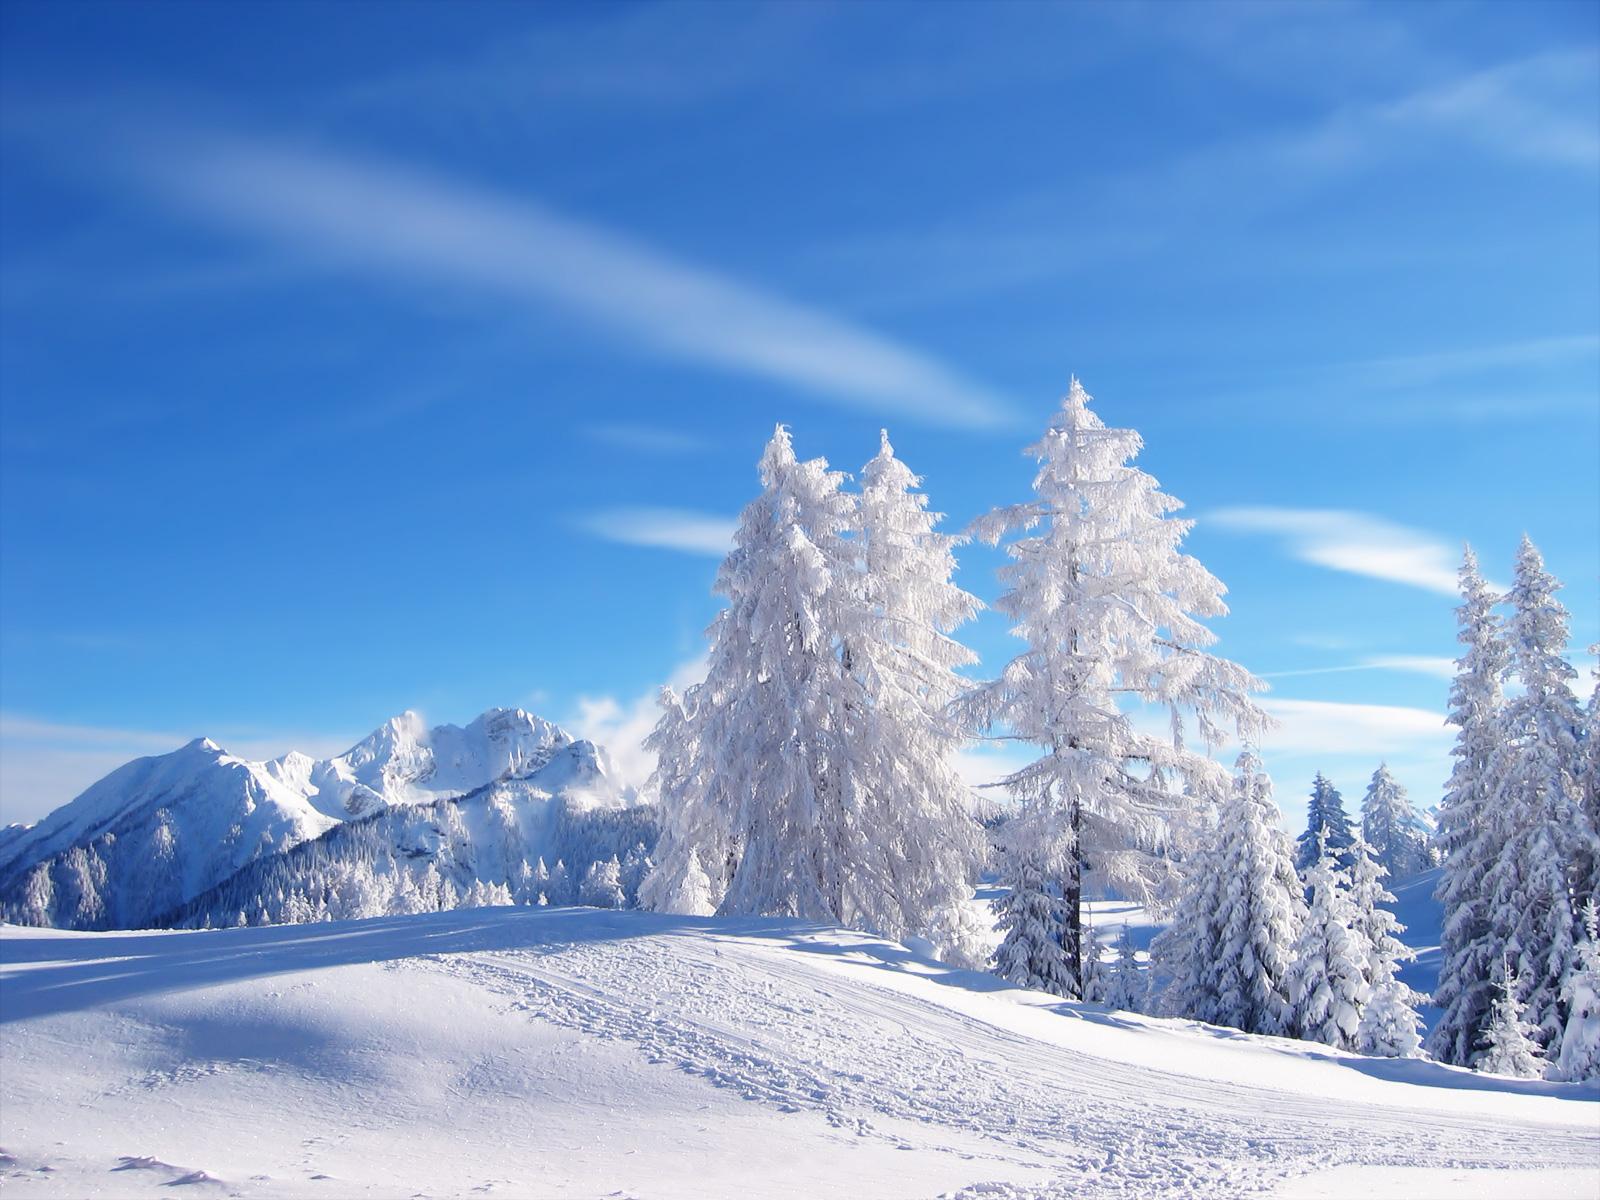 http://3.bp.blogspot.com/-IrSYp-KDtl4/TZnADWfok-I/AAAAAAAADFM/Ar6rF2id39Y/s1600/Winter%20wallpaper%20by%20cool%20wallpapers%20%285%29.jpg